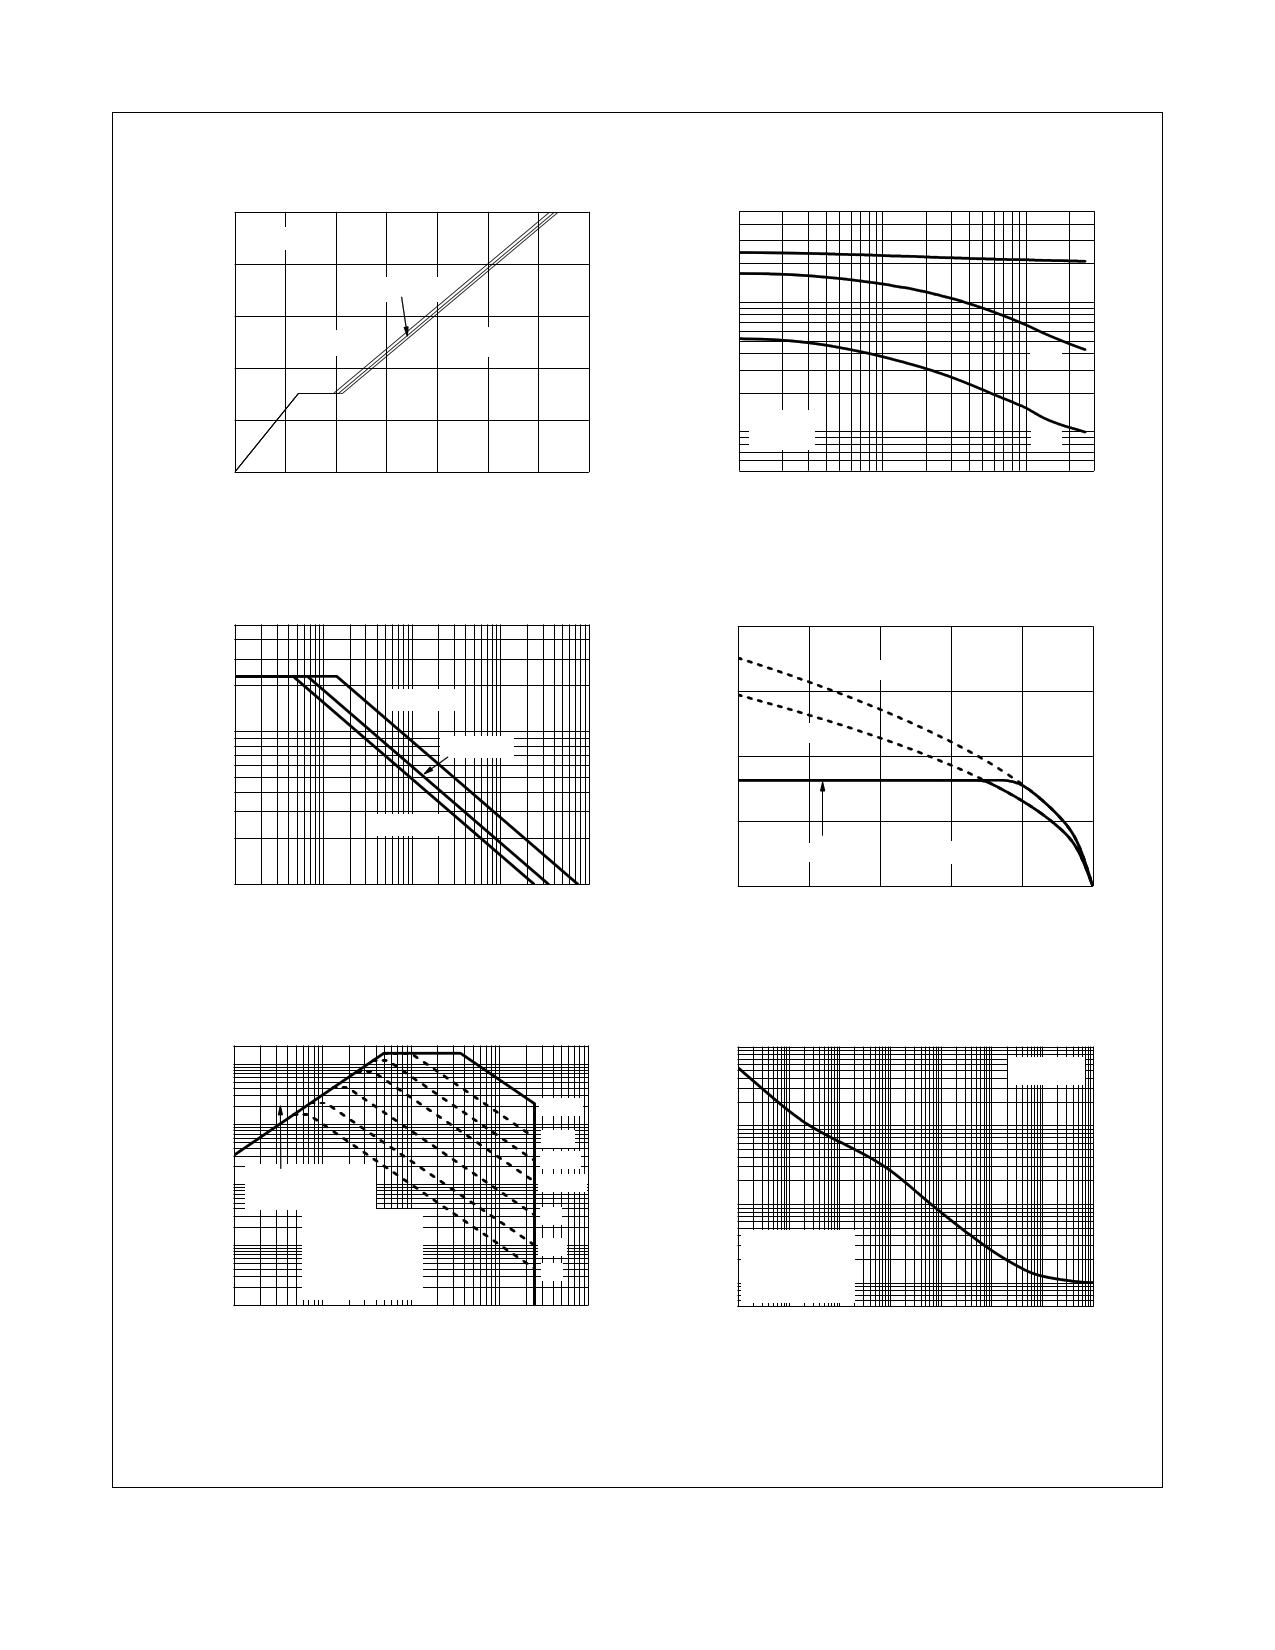 FDMS7572S pdf, 반도체, 판매, 대치품